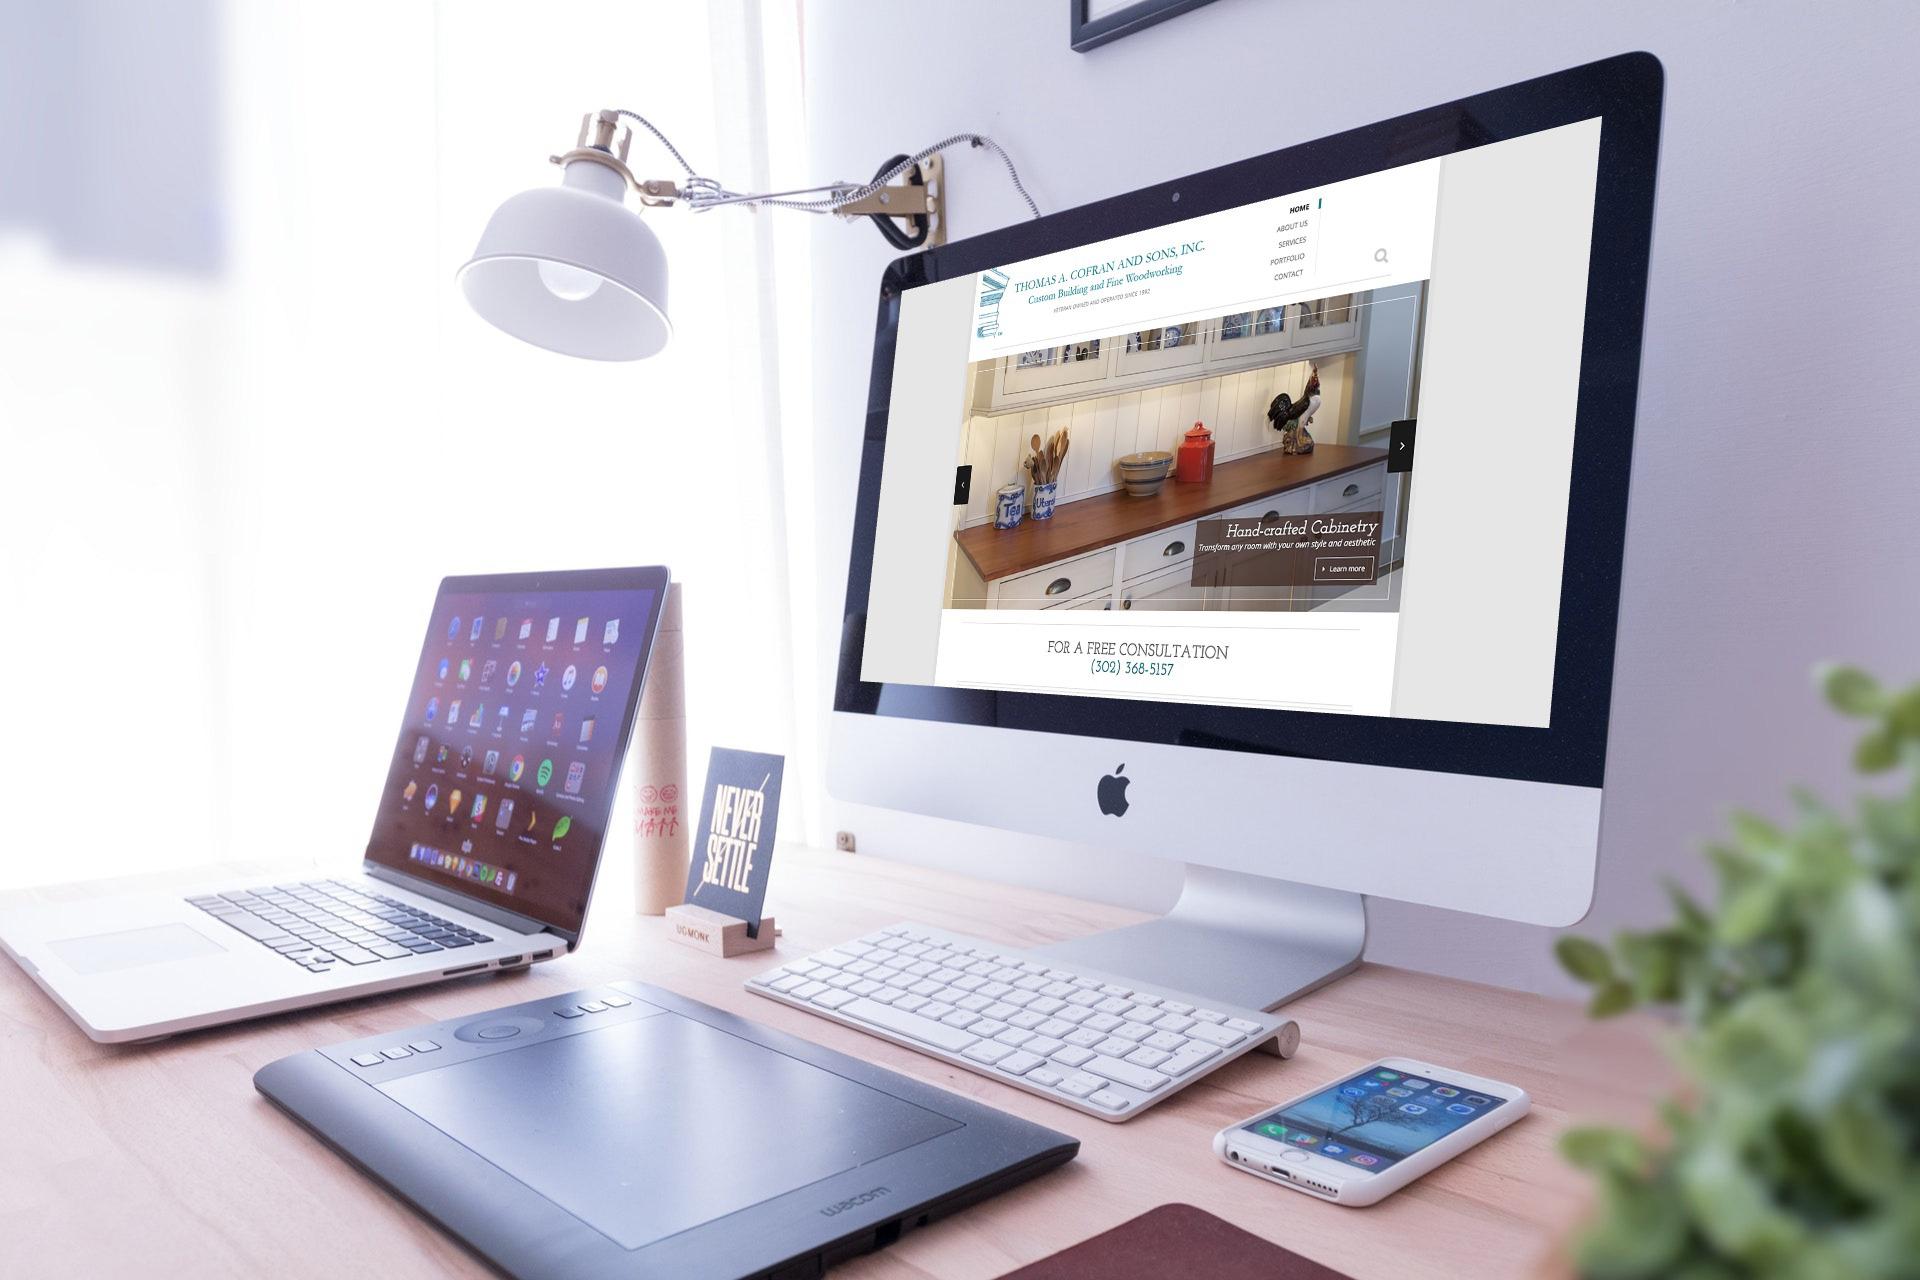 desktop computer displaying Cofran and Sons website